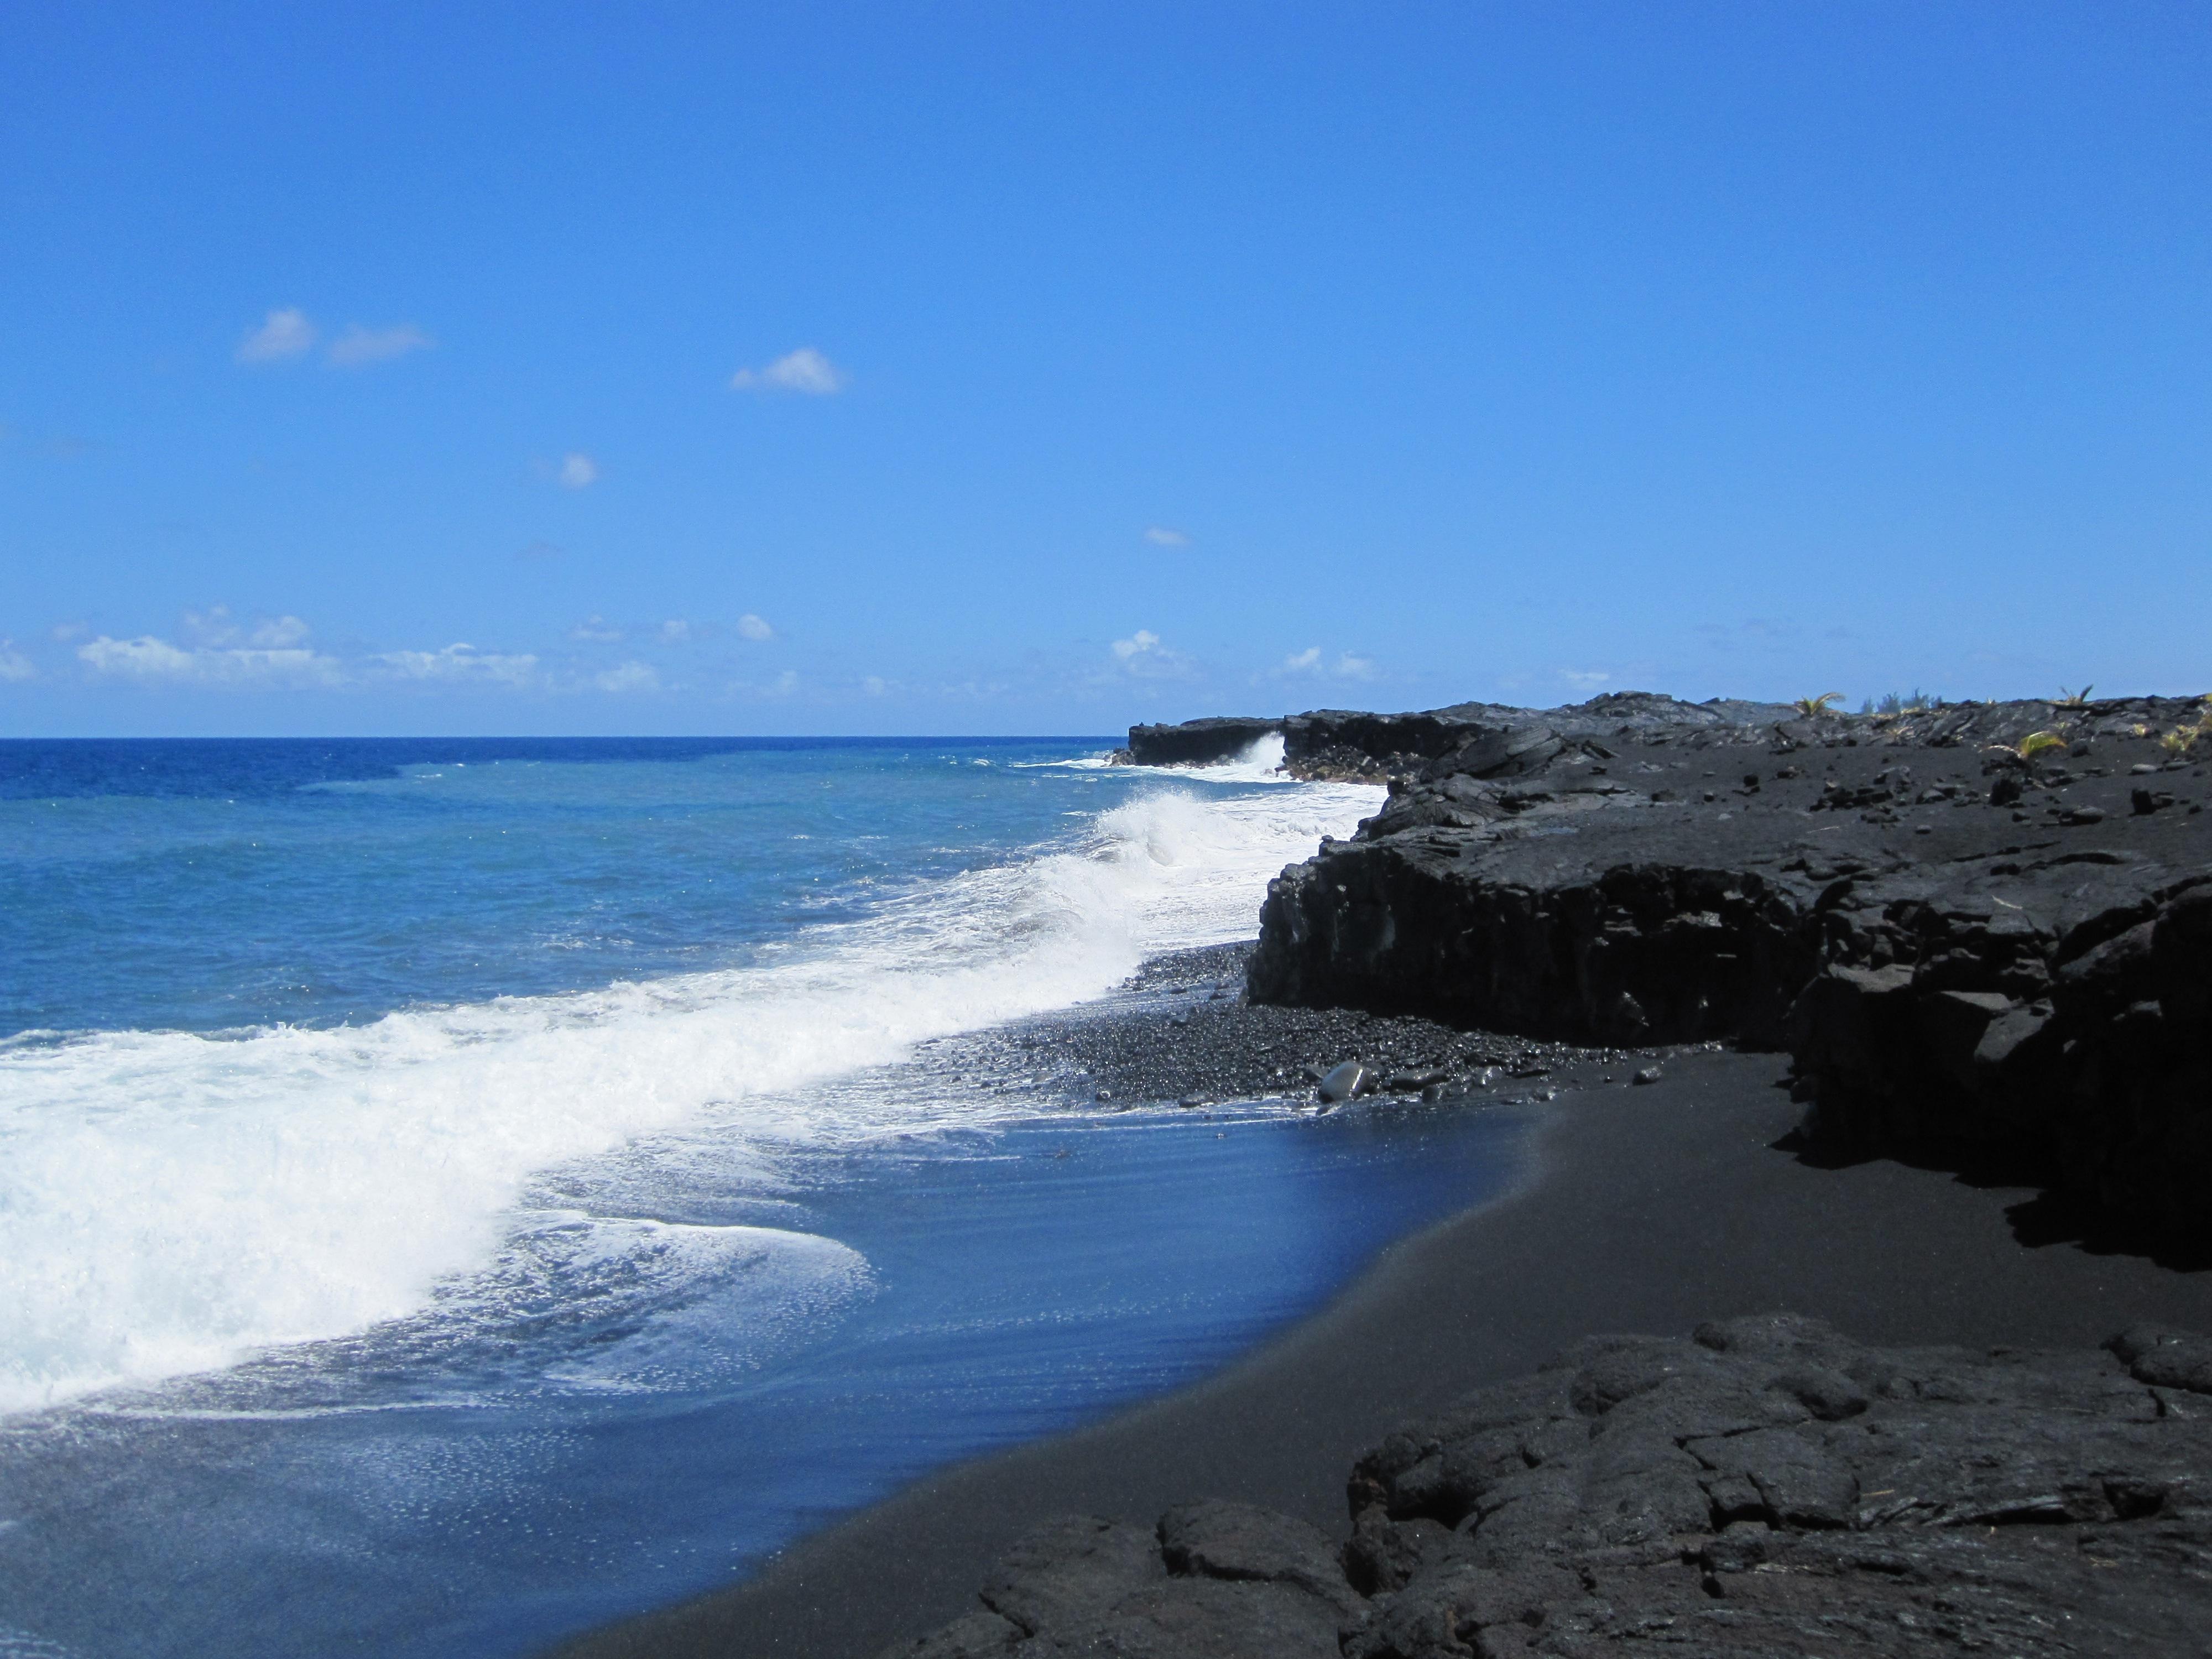 Beach Sea Coast Rock Ocean Horizon White Shore Wave Cliff Cove Holiday Volcano Bay Blue Hawaii